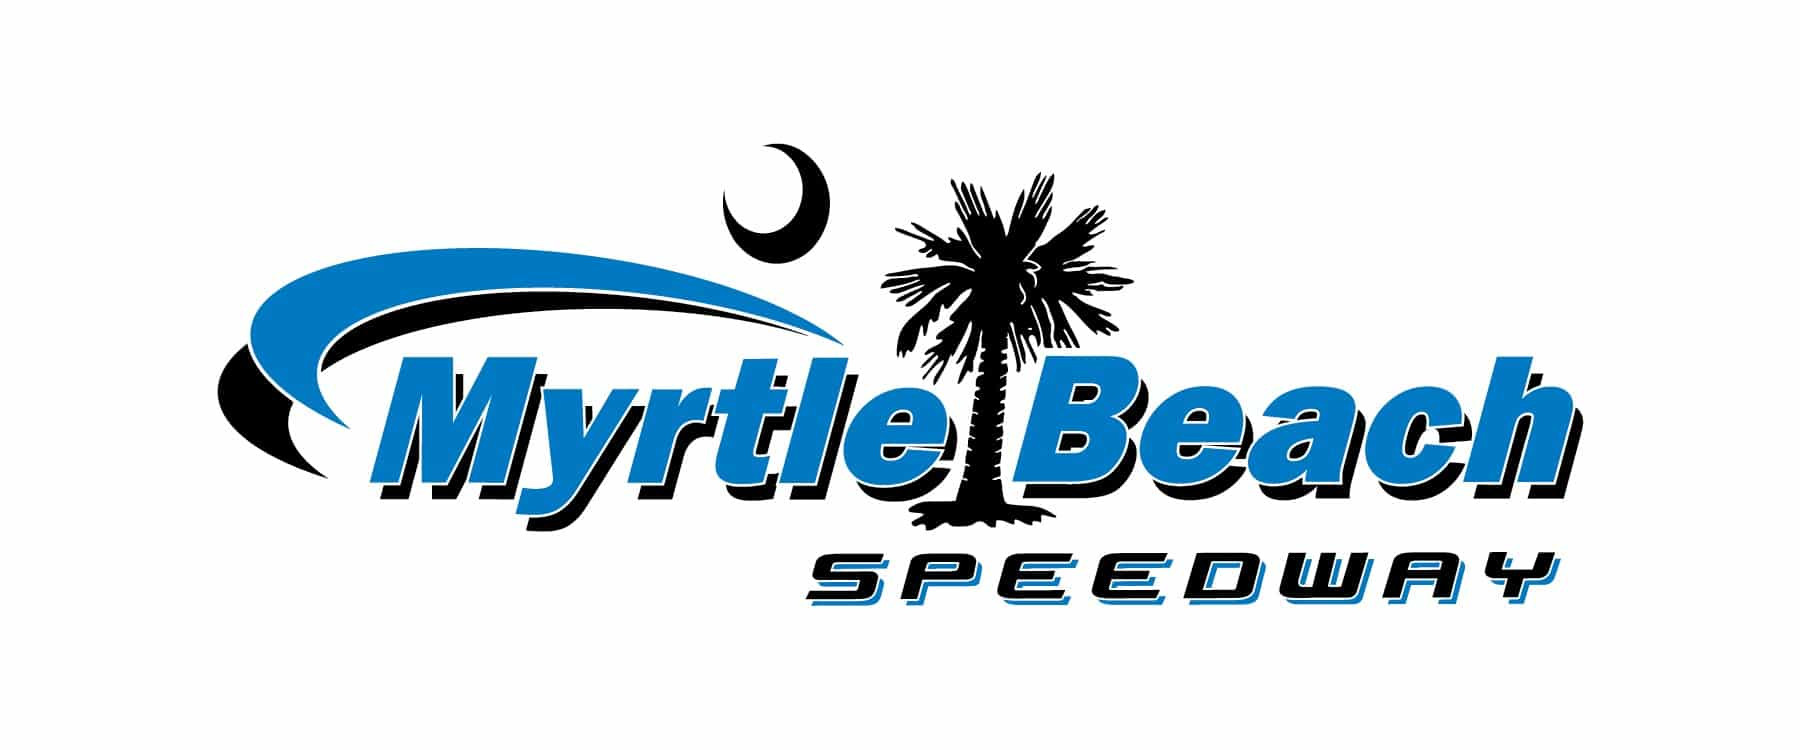 Historical Myrtle Beach Speedway South Carolina